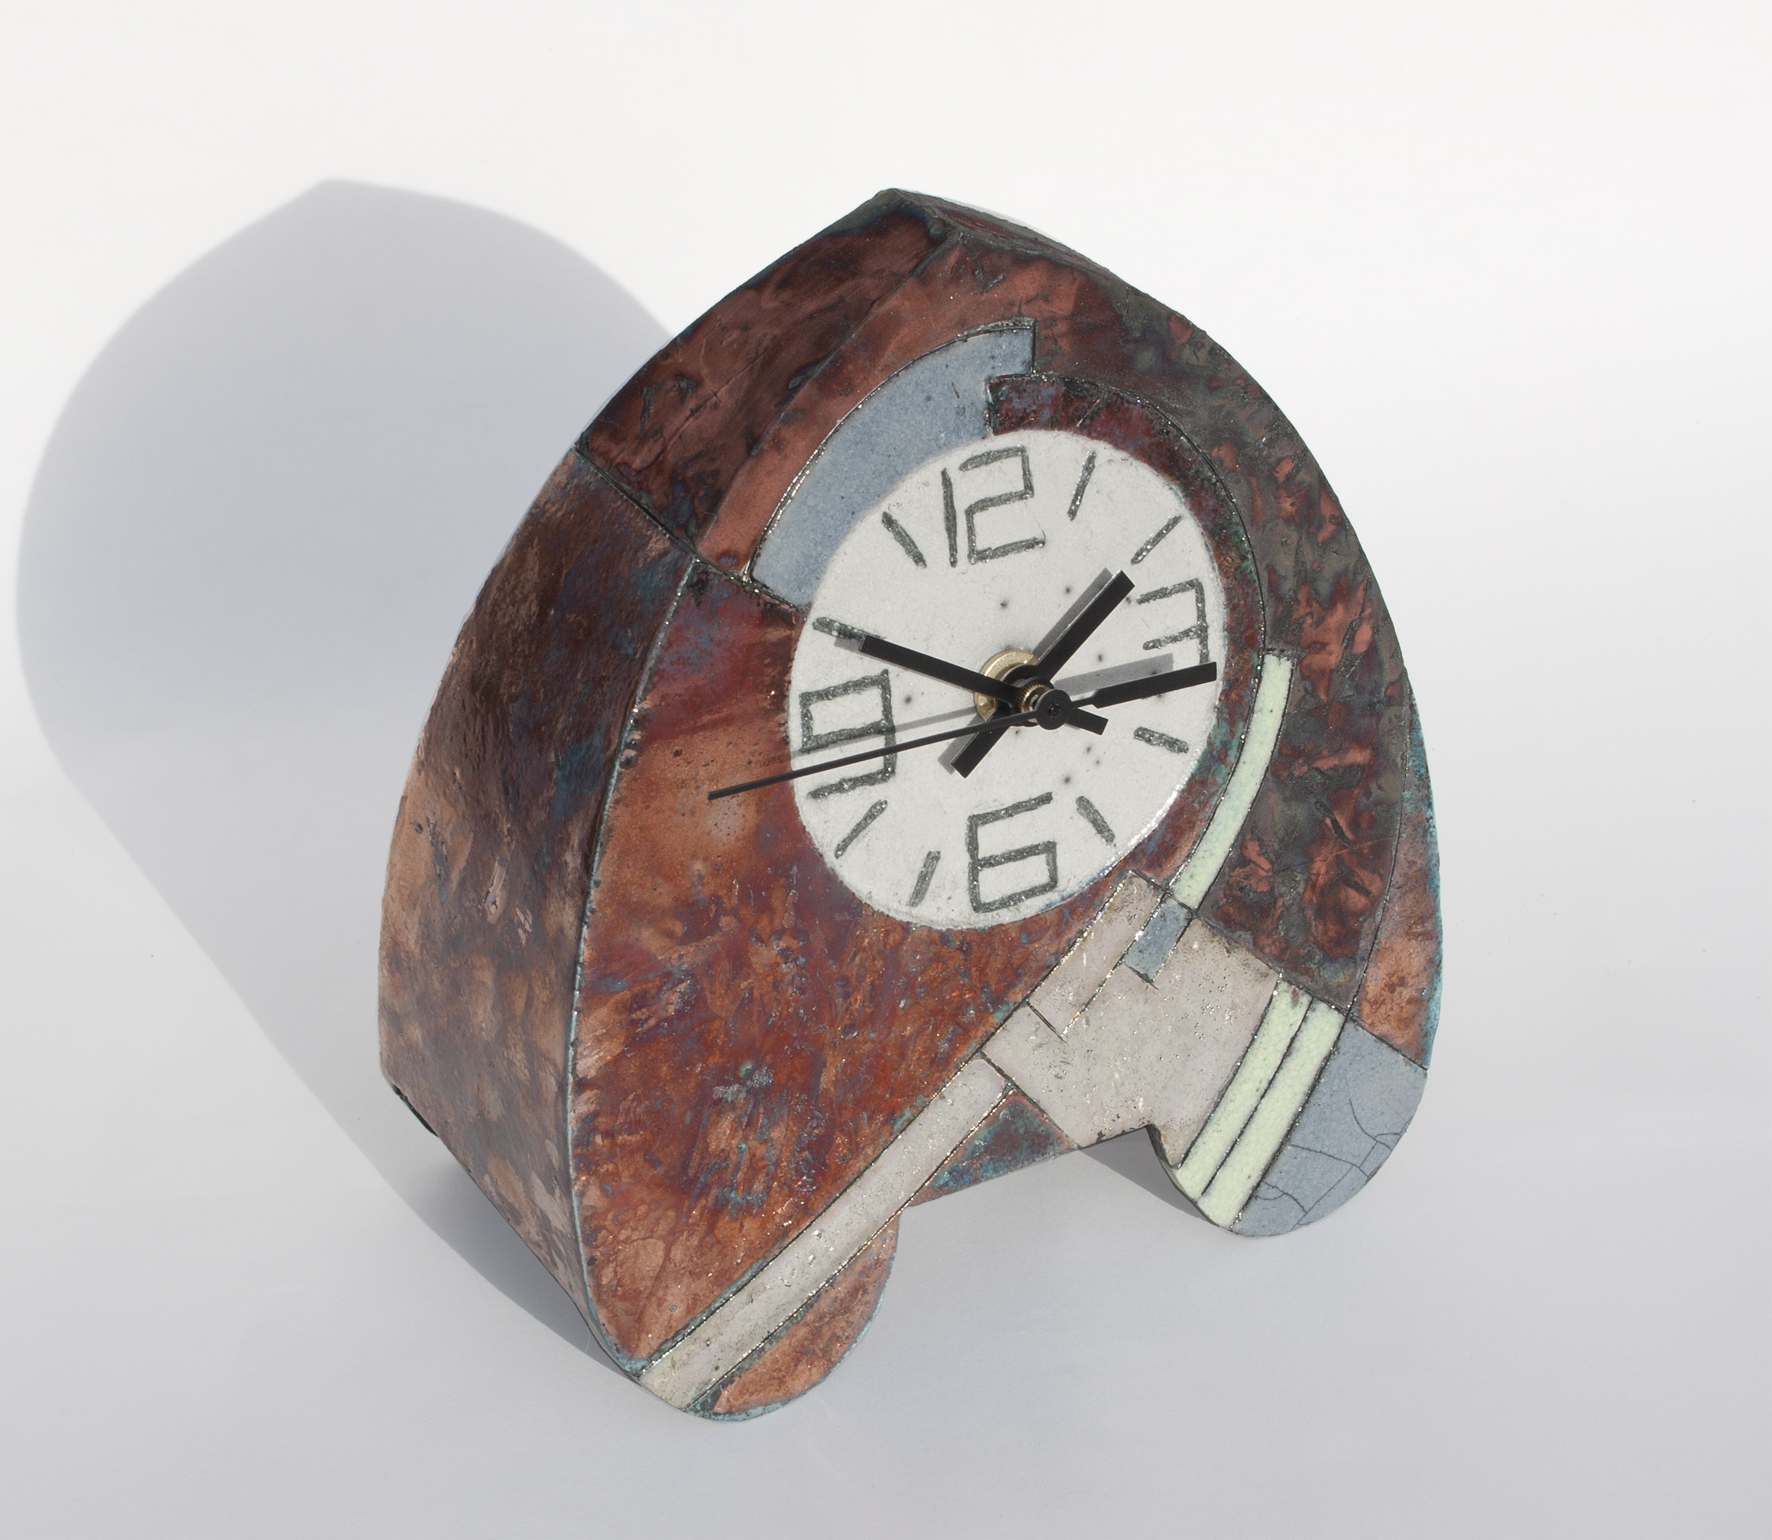 Arch clock by Sally Brooks